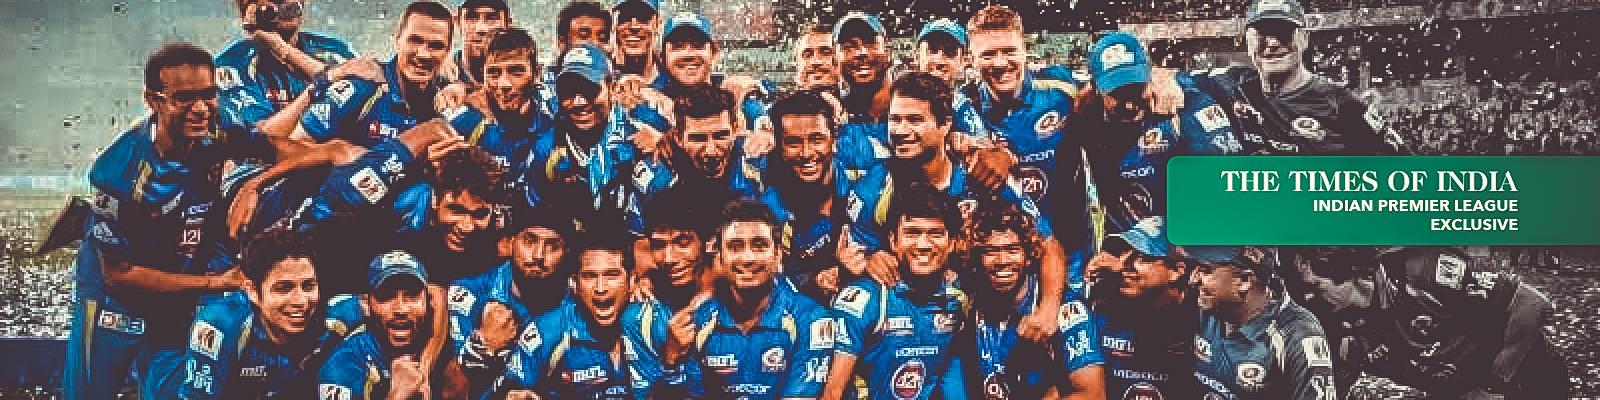 Teams with maximum winning margin by runs in IPL